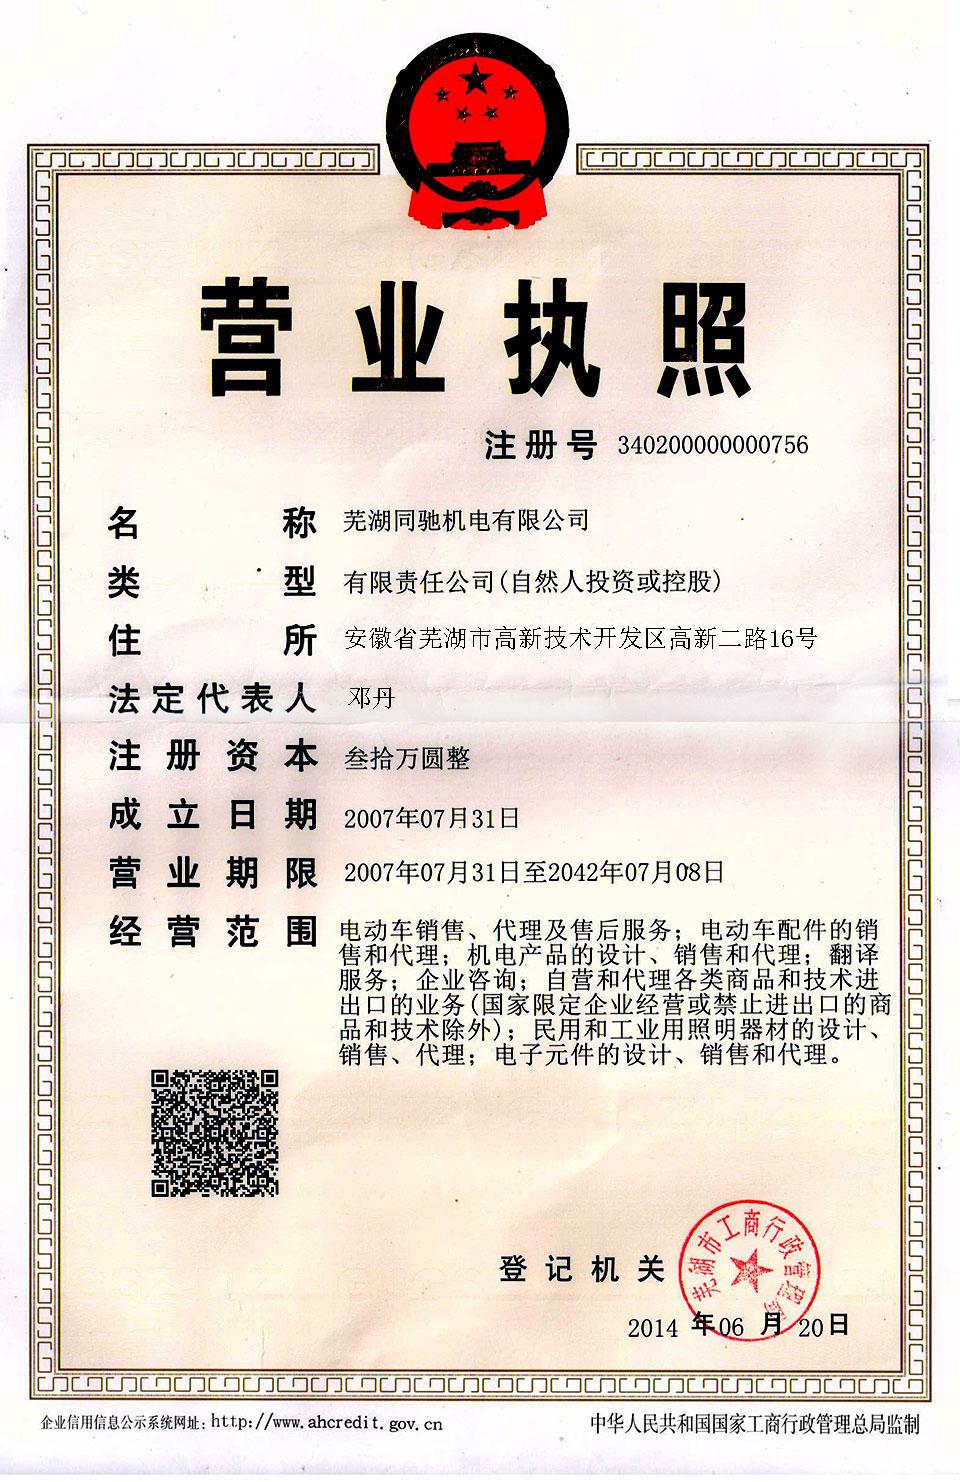 NOCO SHOP Business license